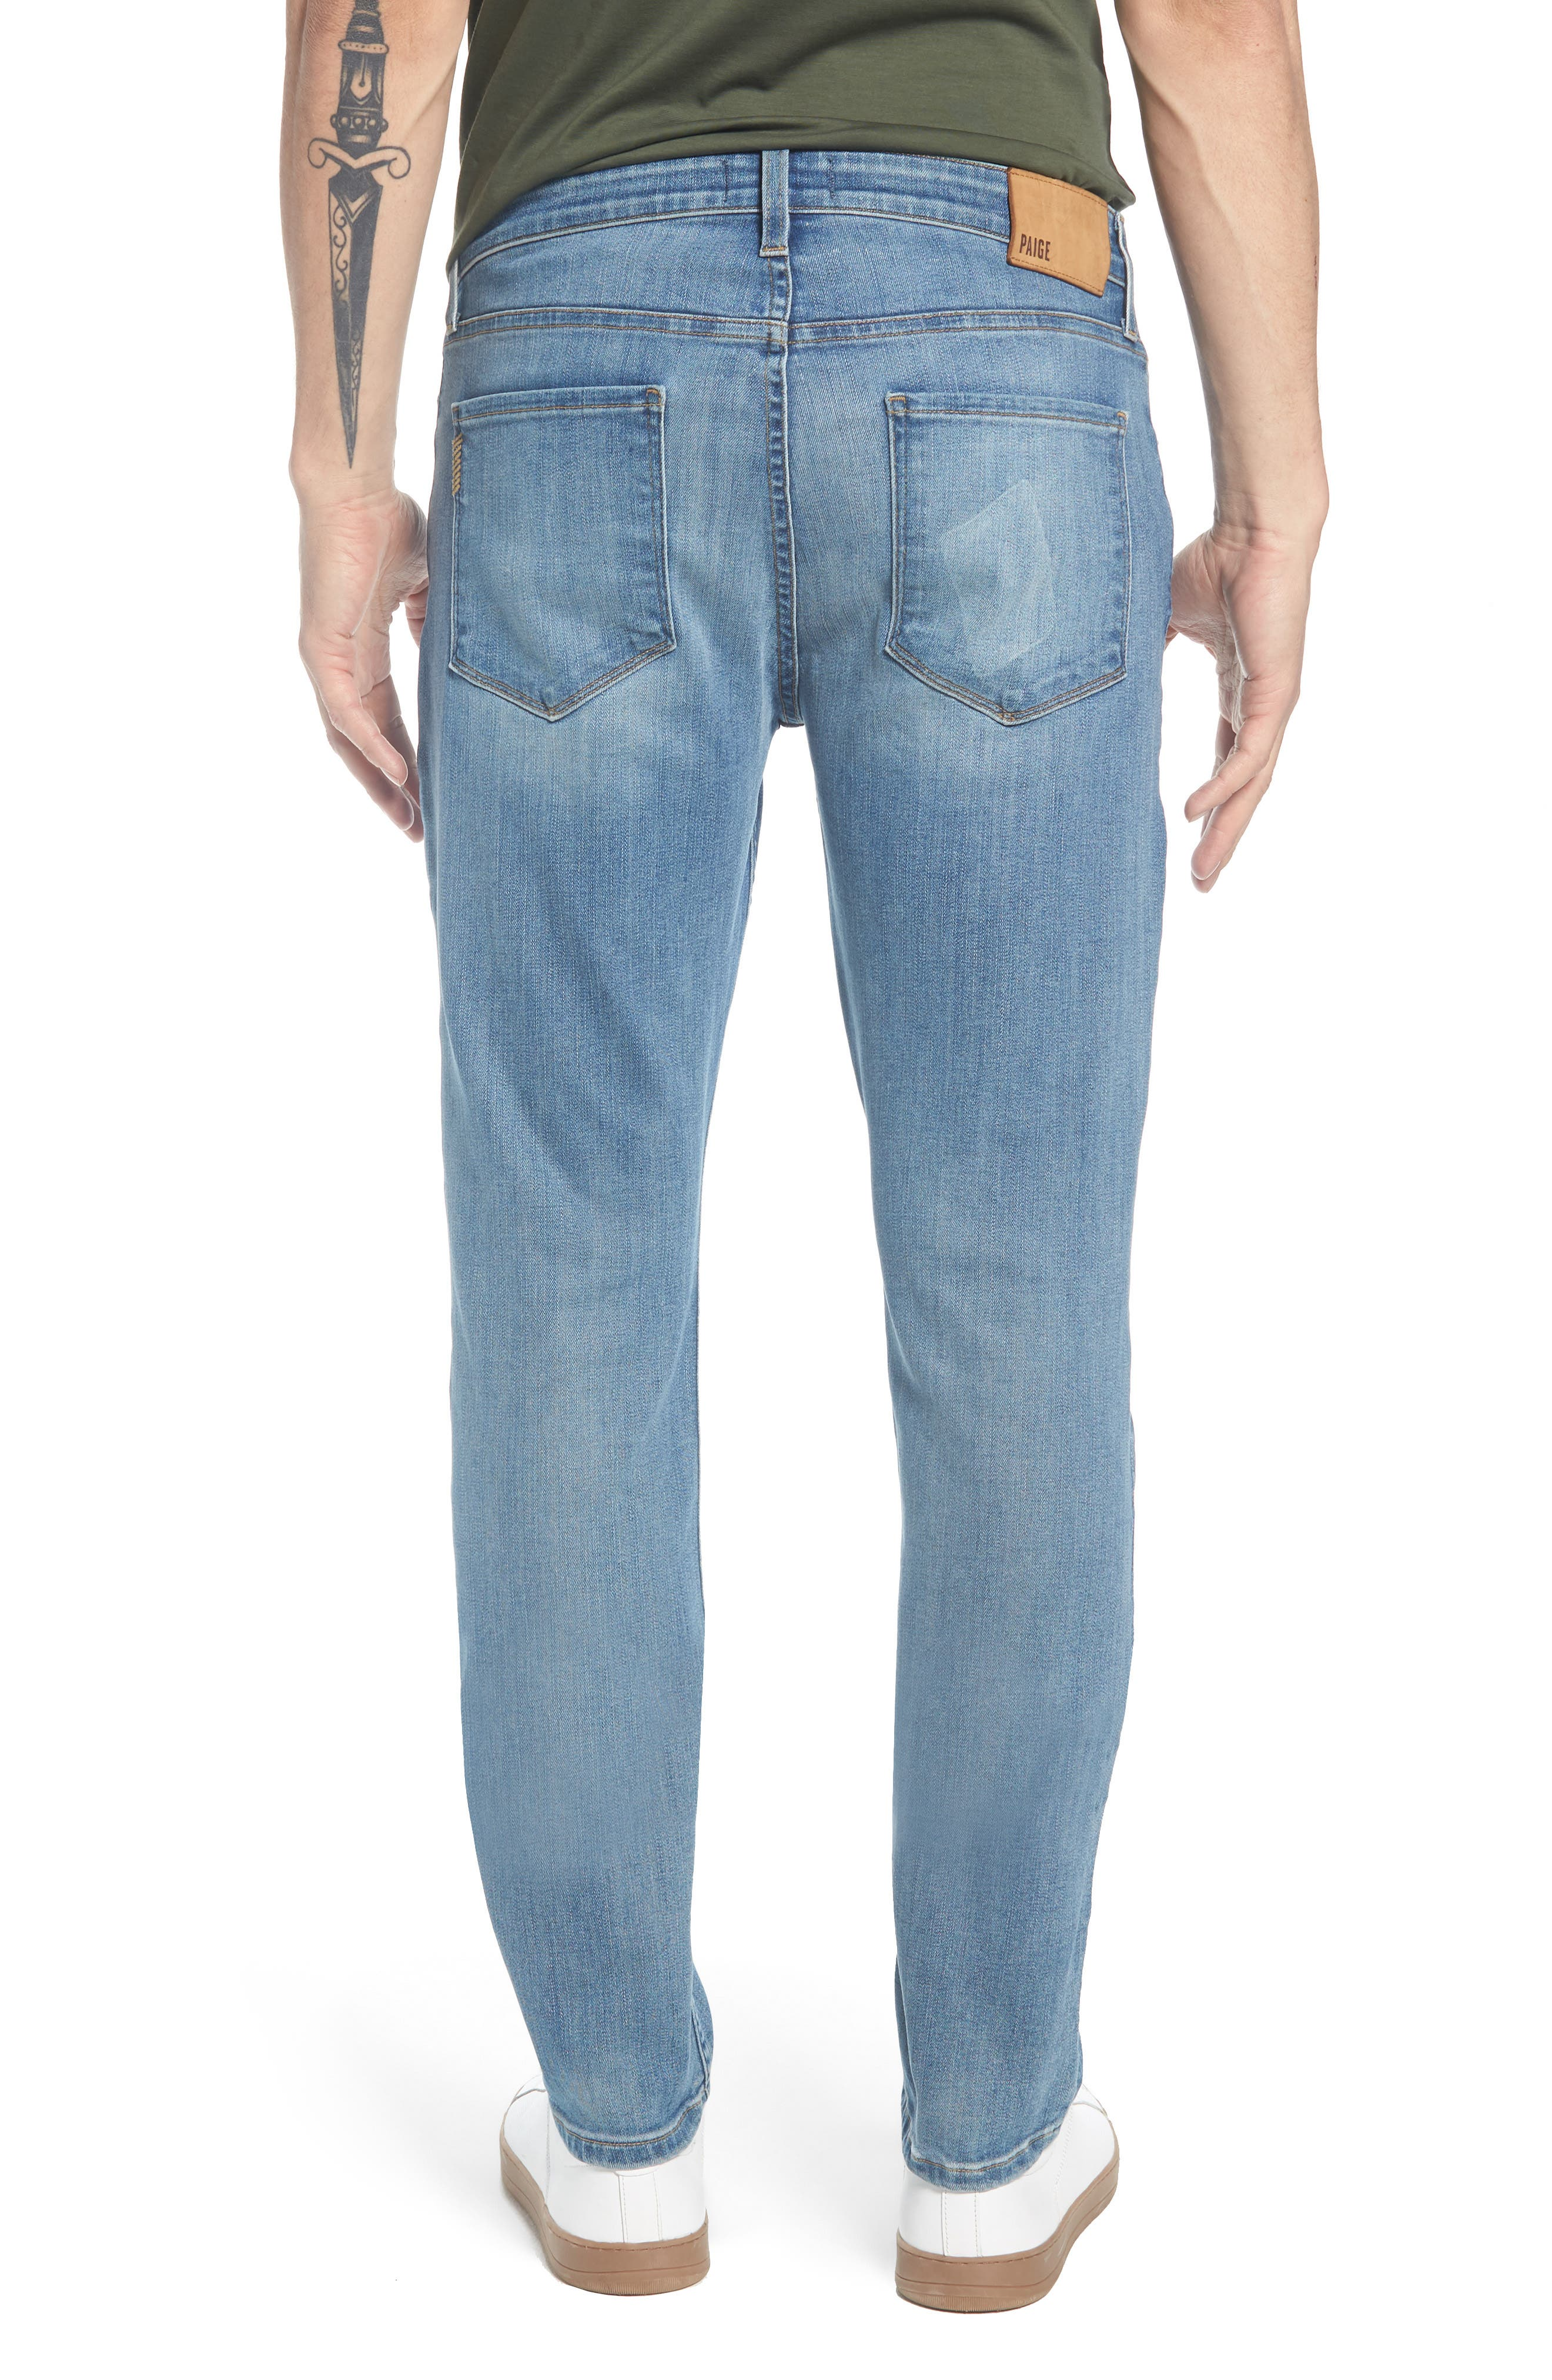 Transcend - Lennox Slim Fit Jeans,                             Alternate thumbnail 2, color,                             CARTWRIGHT